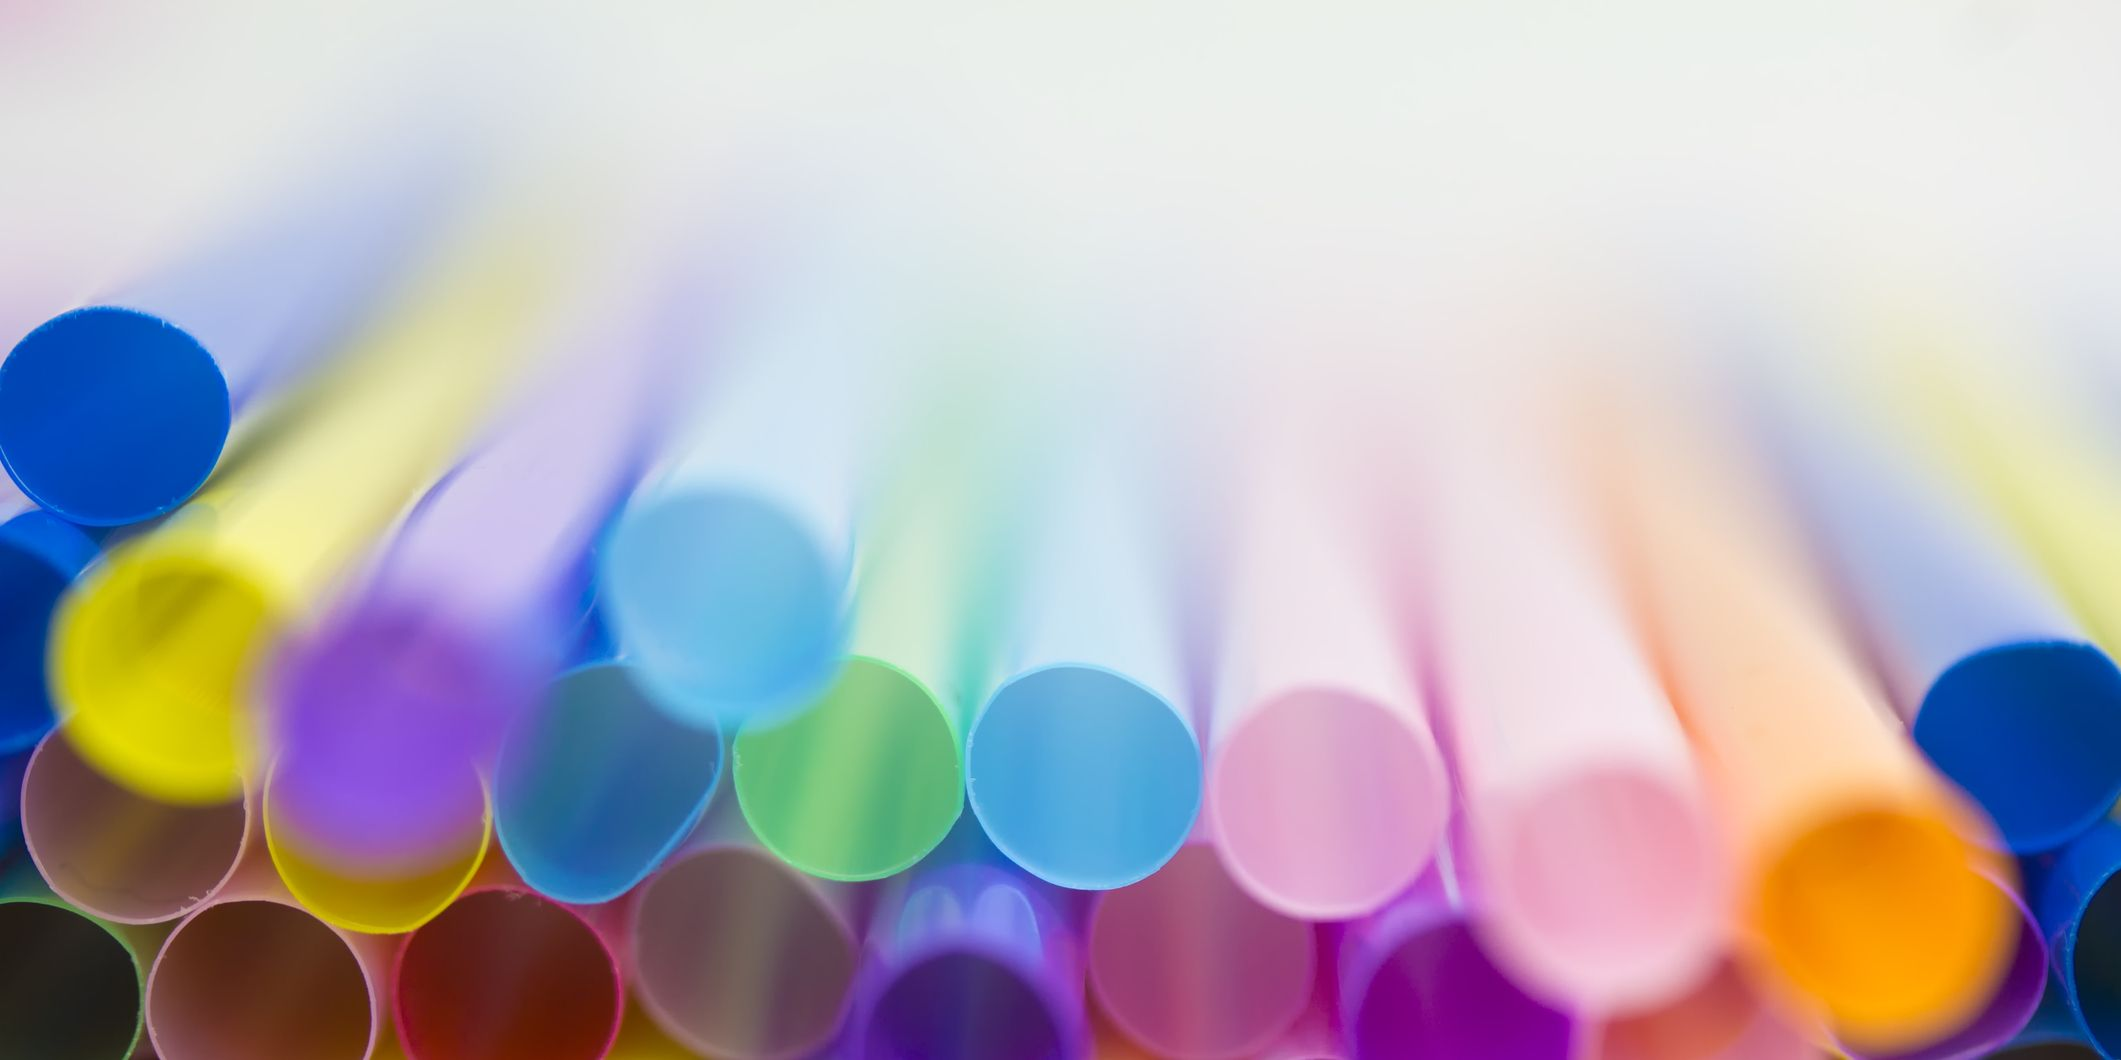 Colourful plastic drinking straws